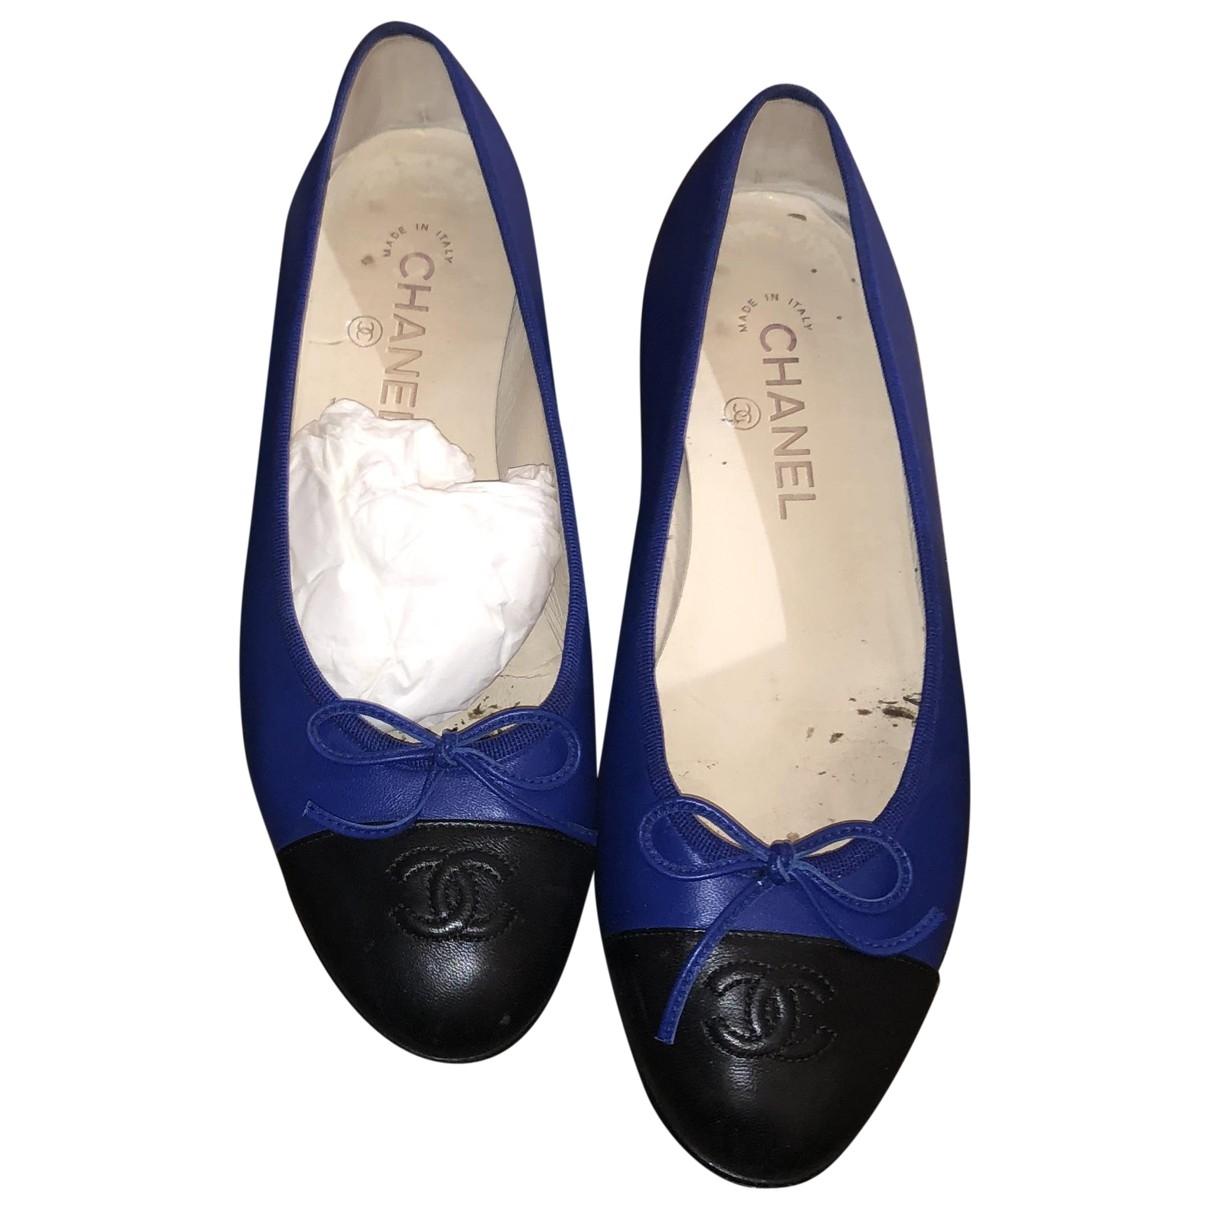 Chanel \N Blue Leather Ballet flats for Women 39 EU